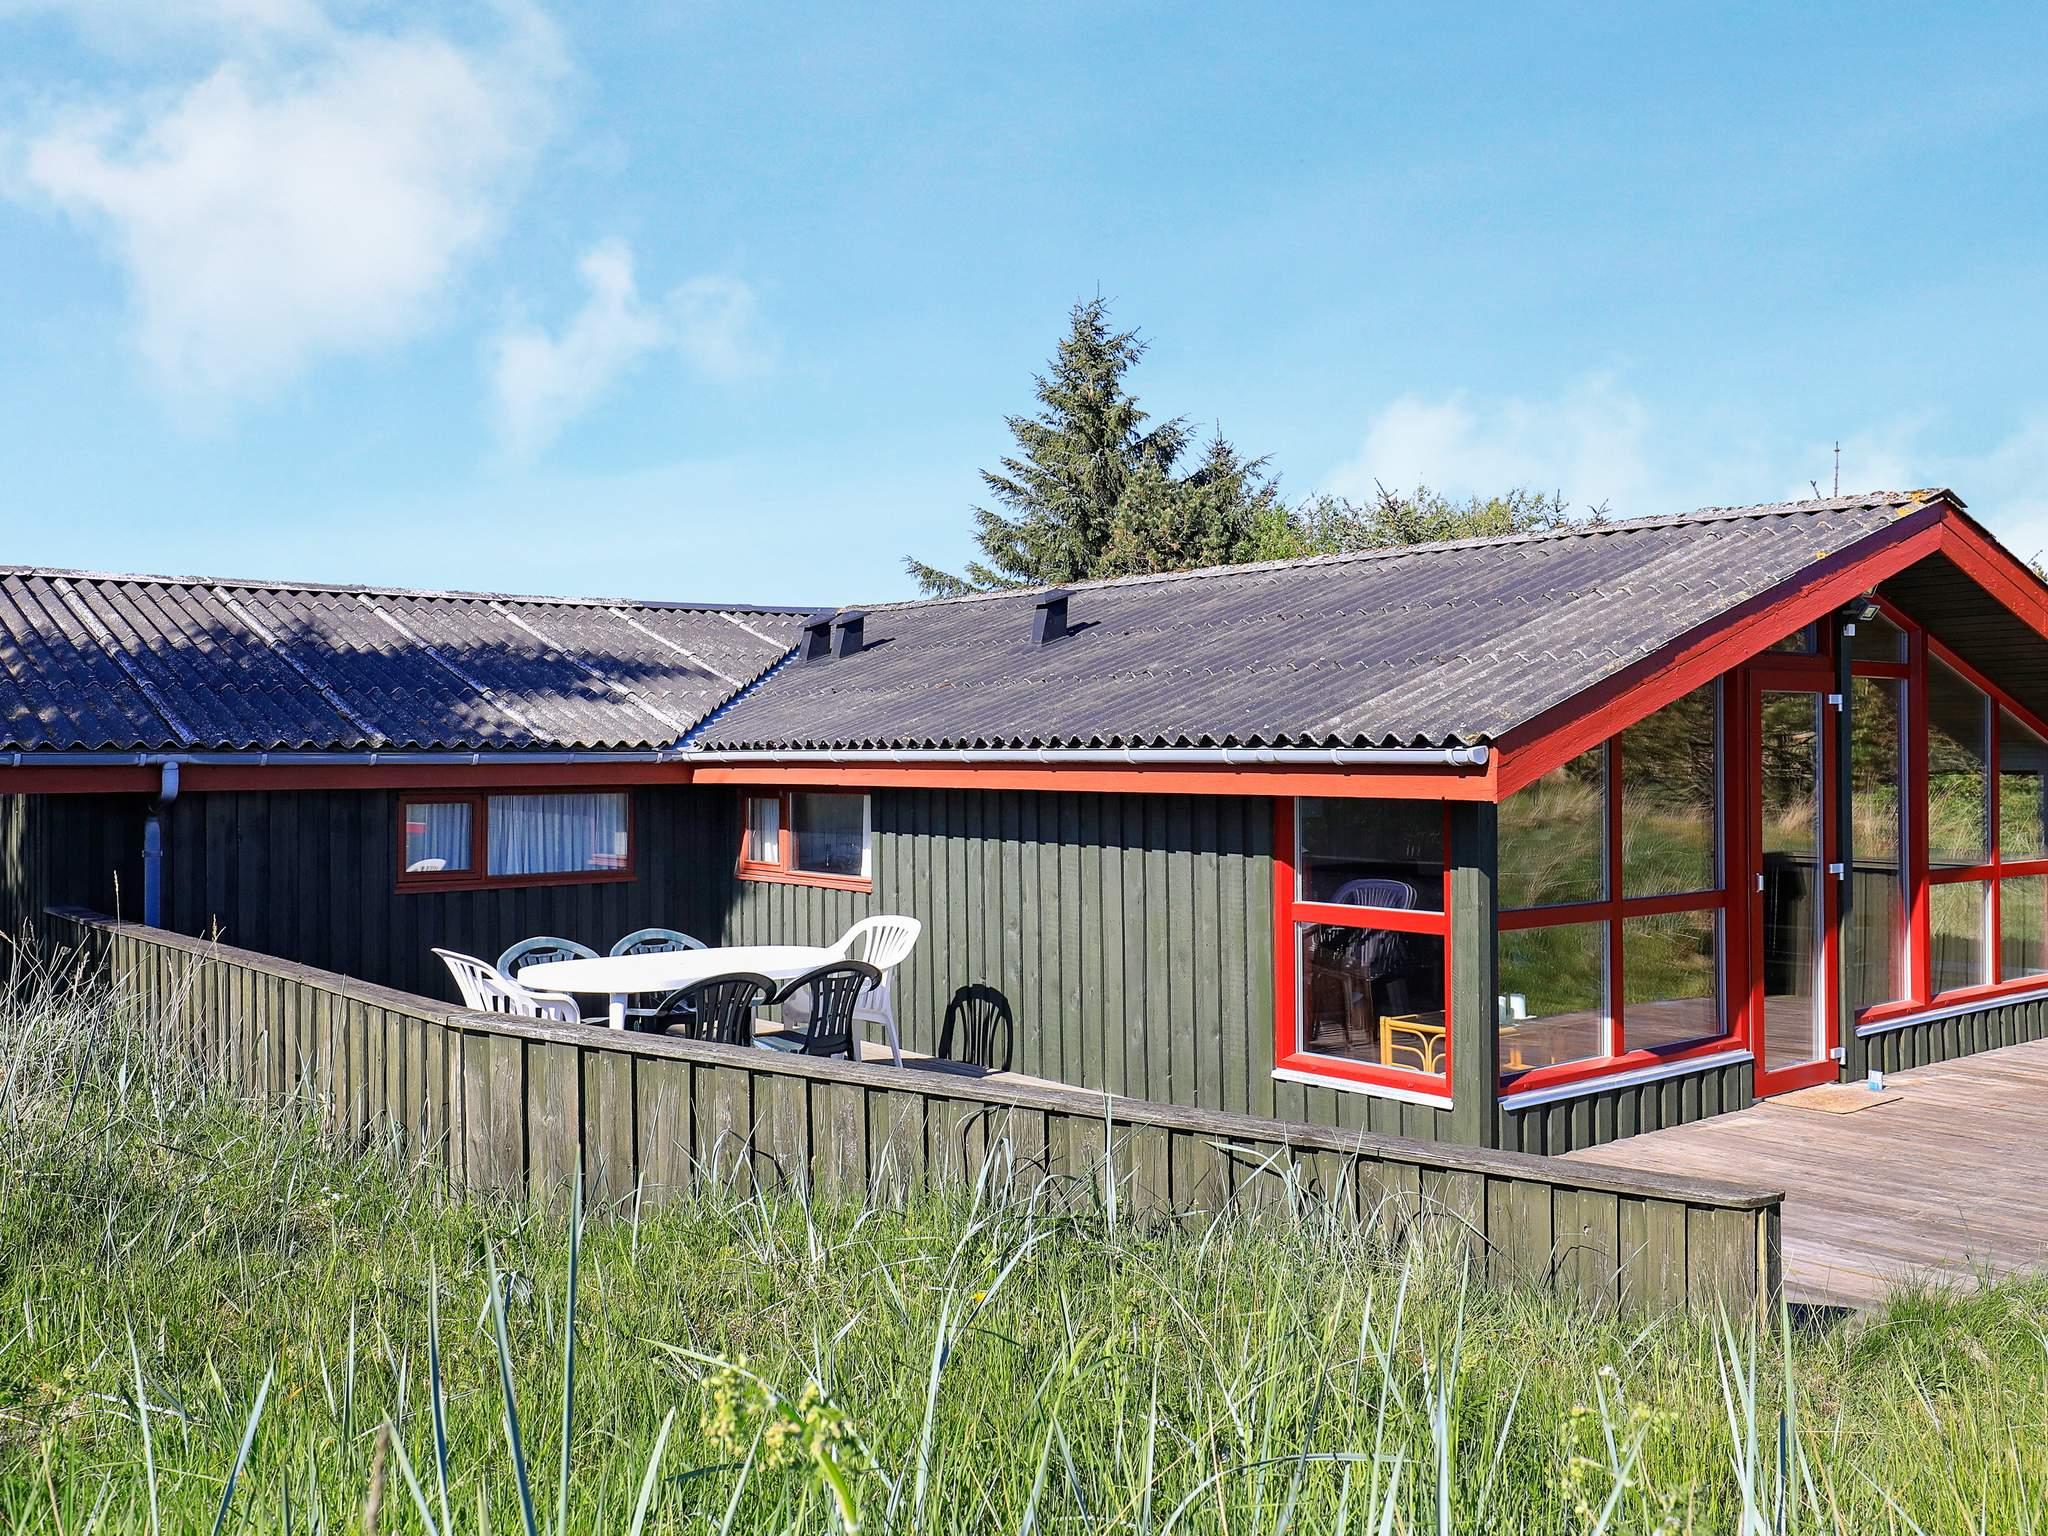 Ferienhaus Kjul Strand (319409), Hirtshals, , Dänische Nordsee, Dänemark, Bild 15